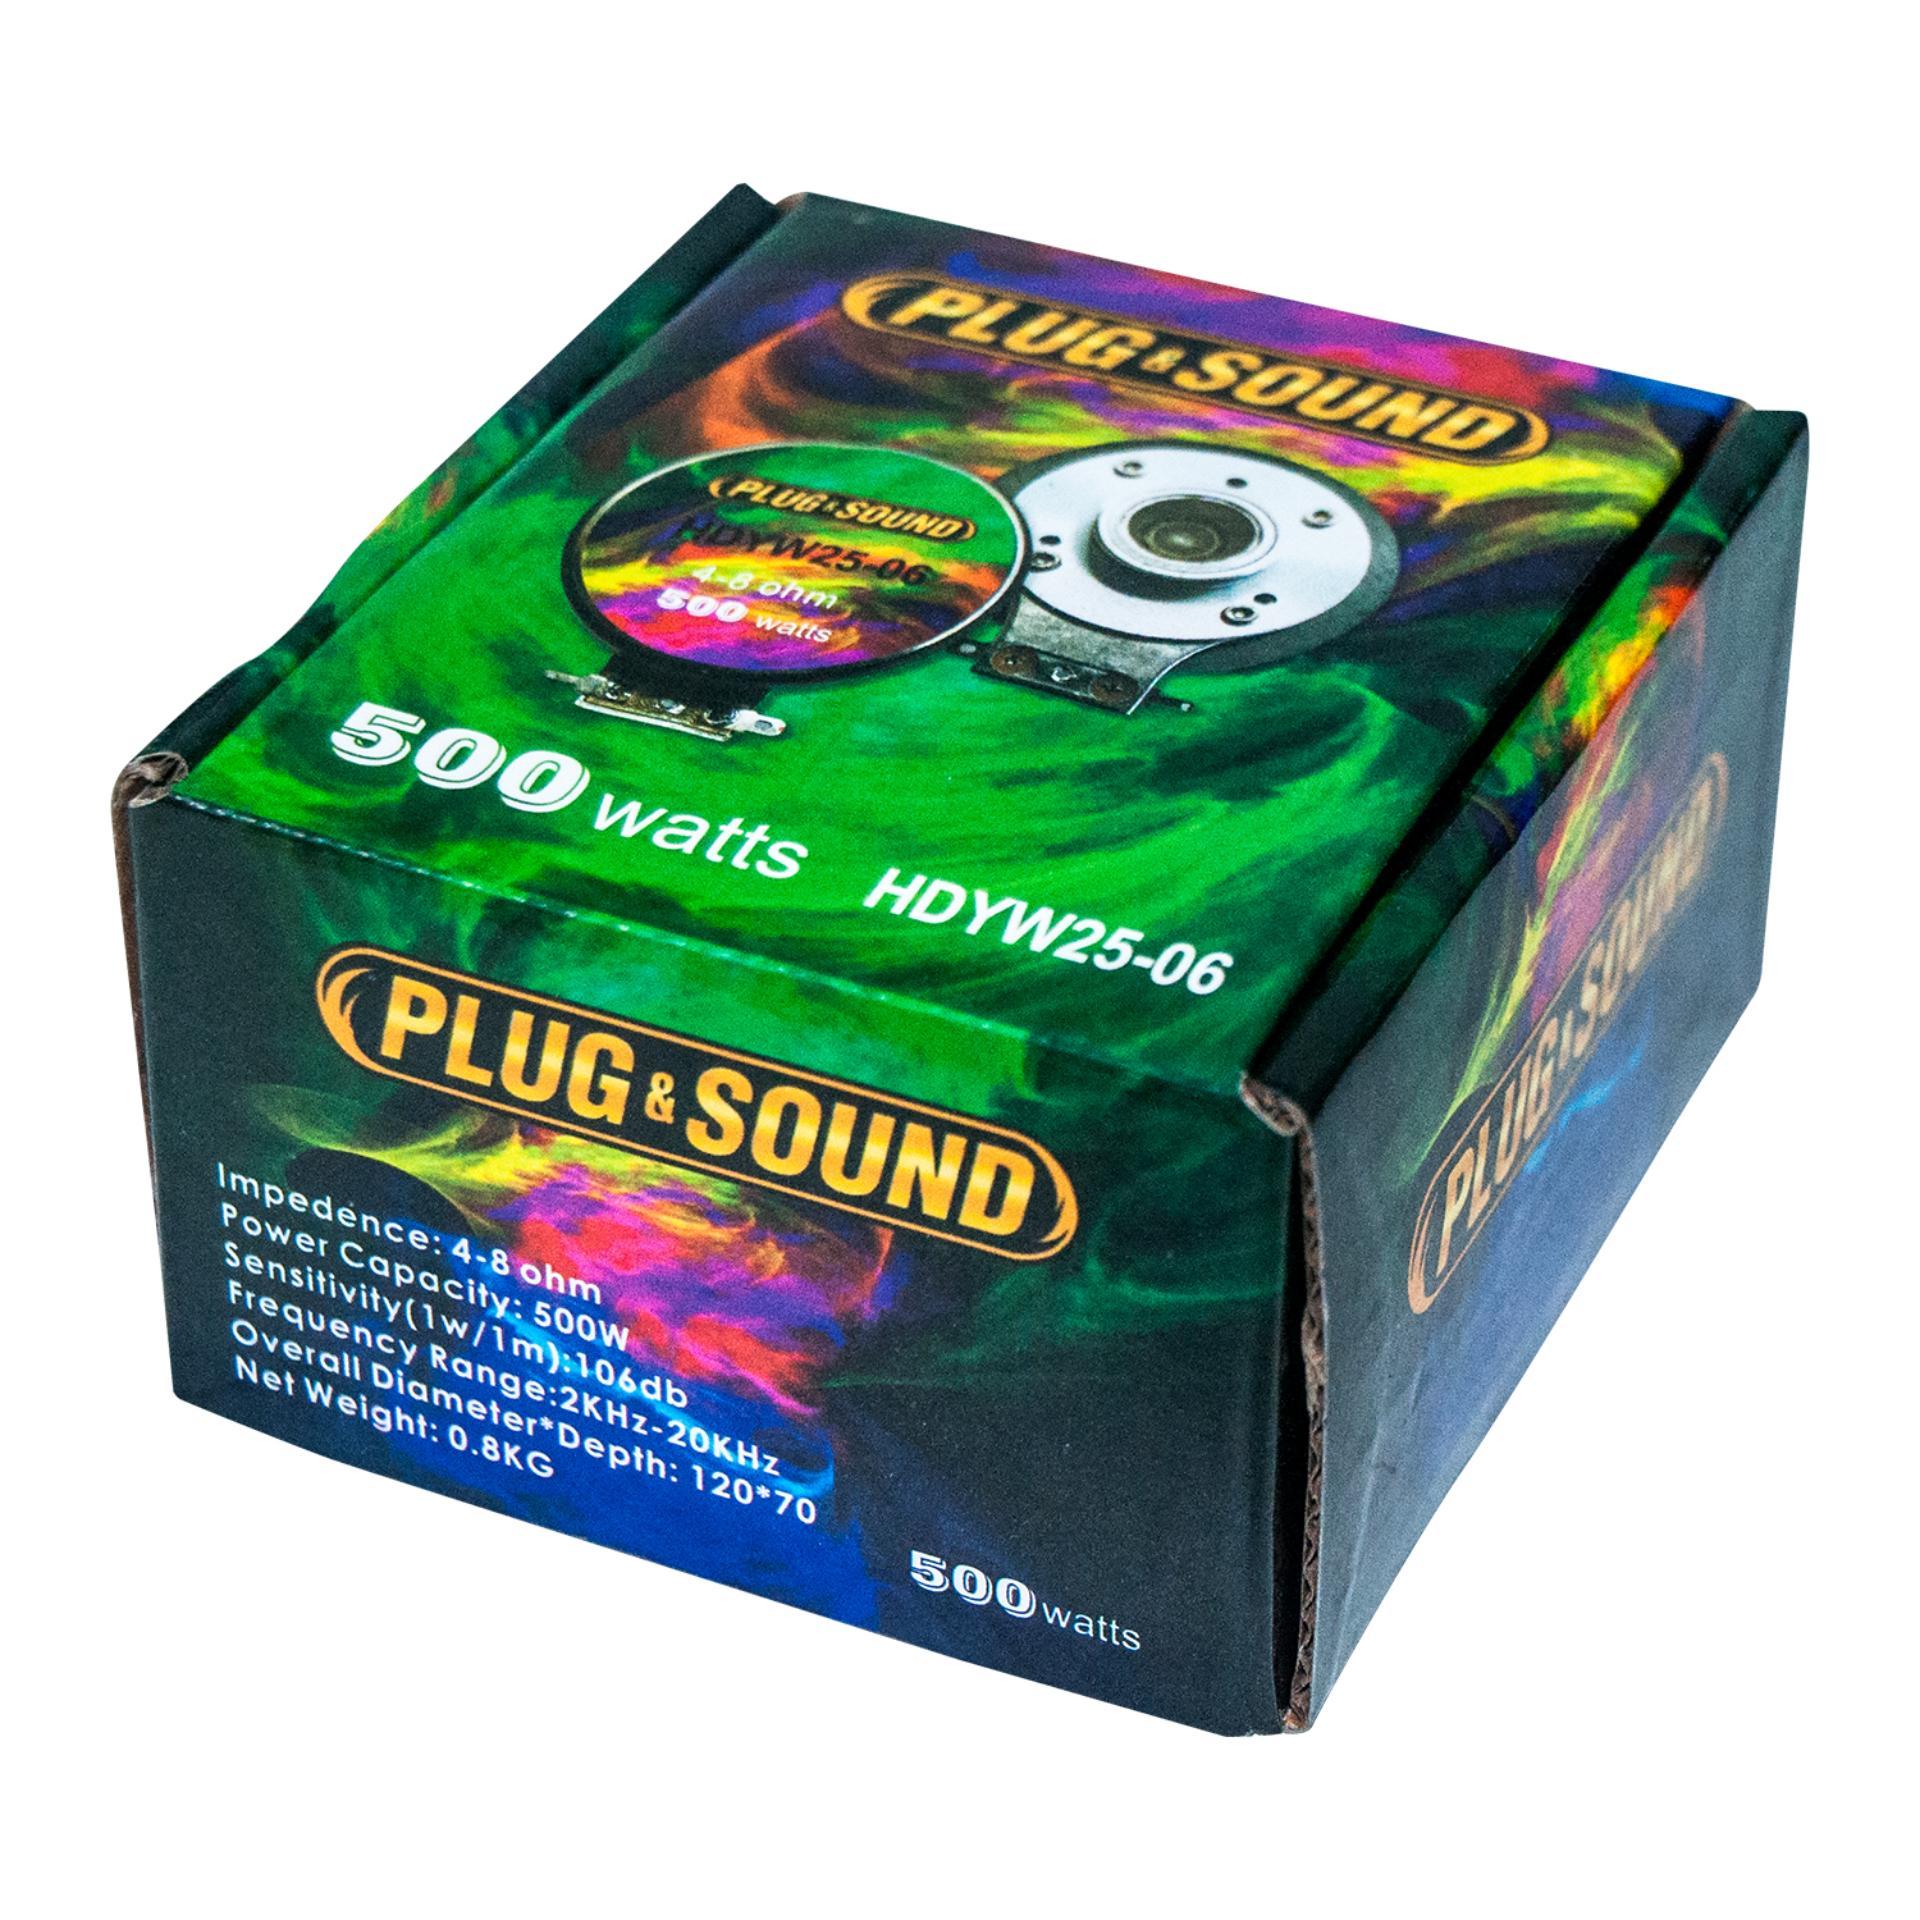 PLUG & SOUND Compression Driver Unit ...